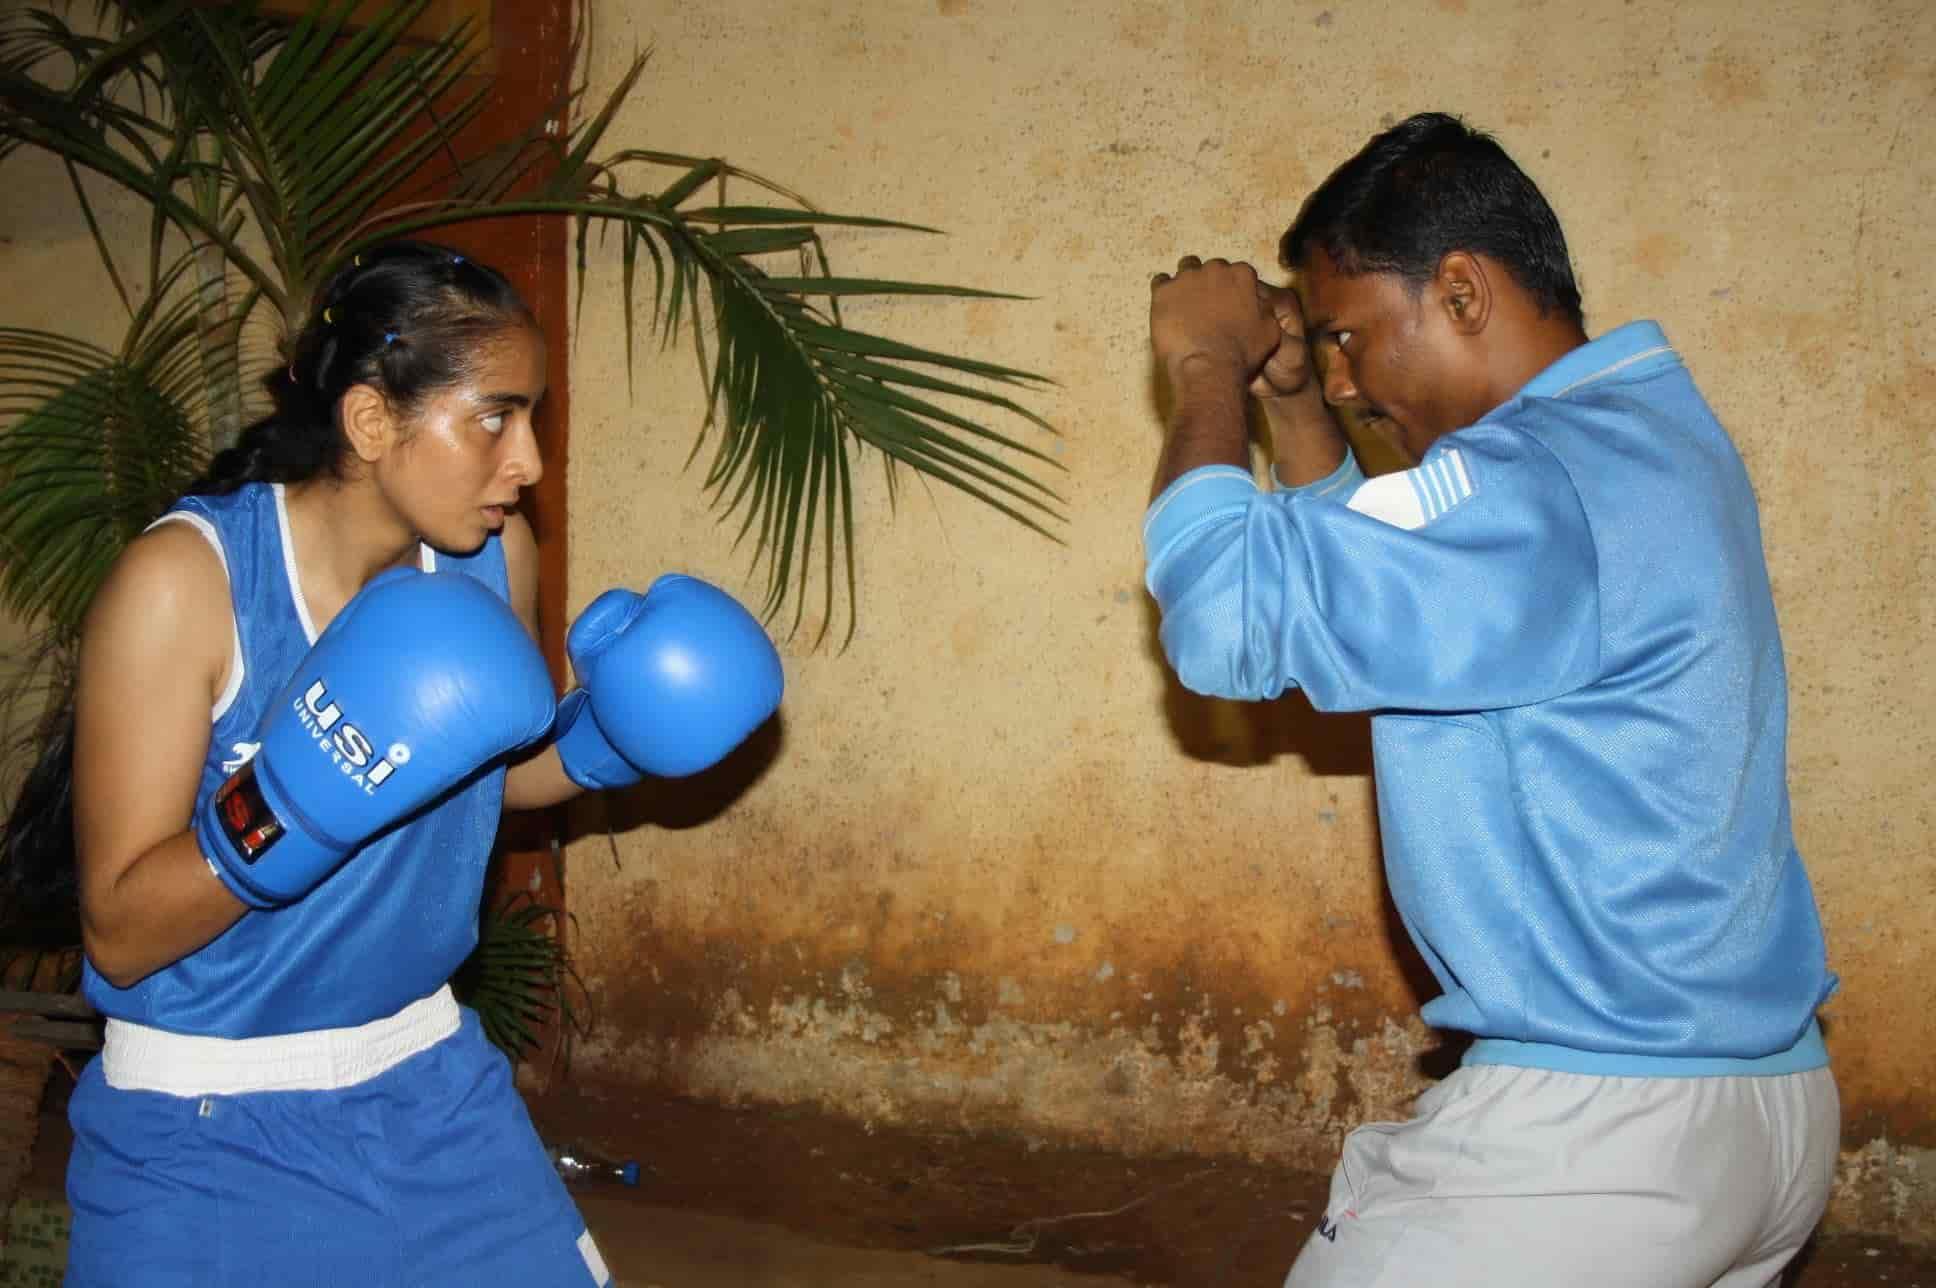 KD Boxing Academy, Matunga East - Boxing Classes in Mumbai - Justdial